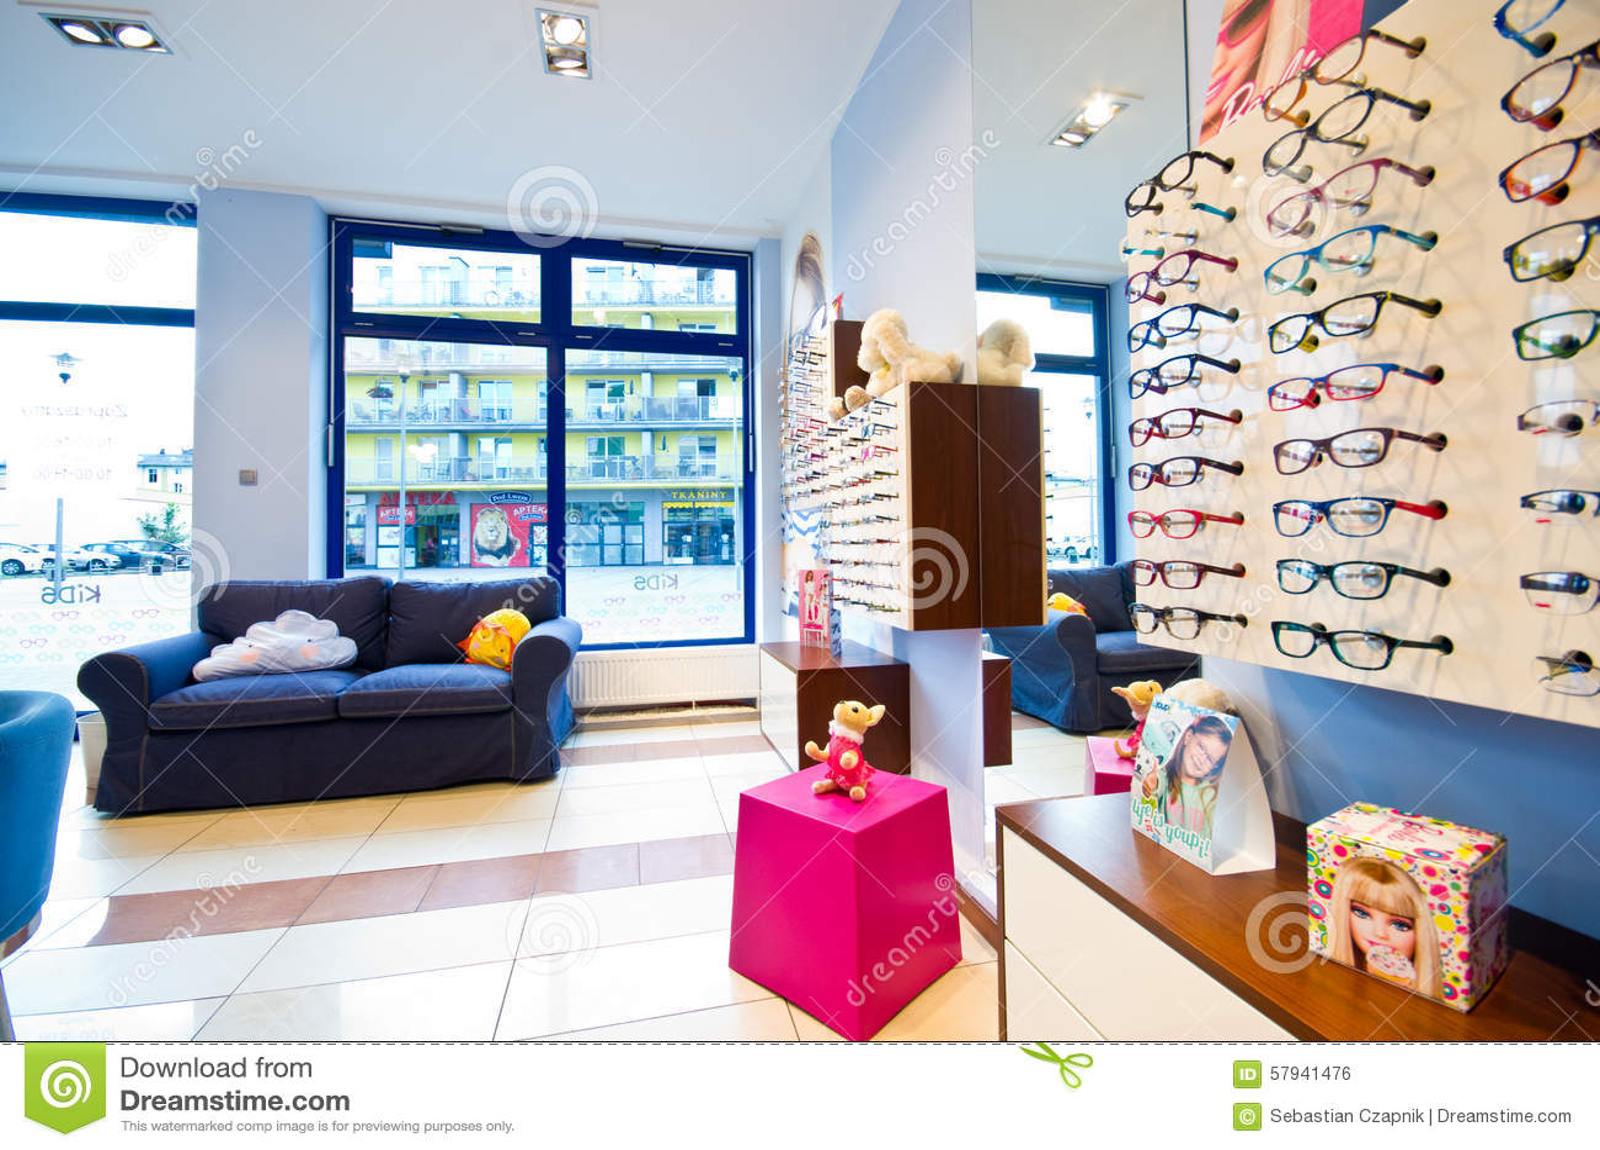 Optician s salon for children s glasses